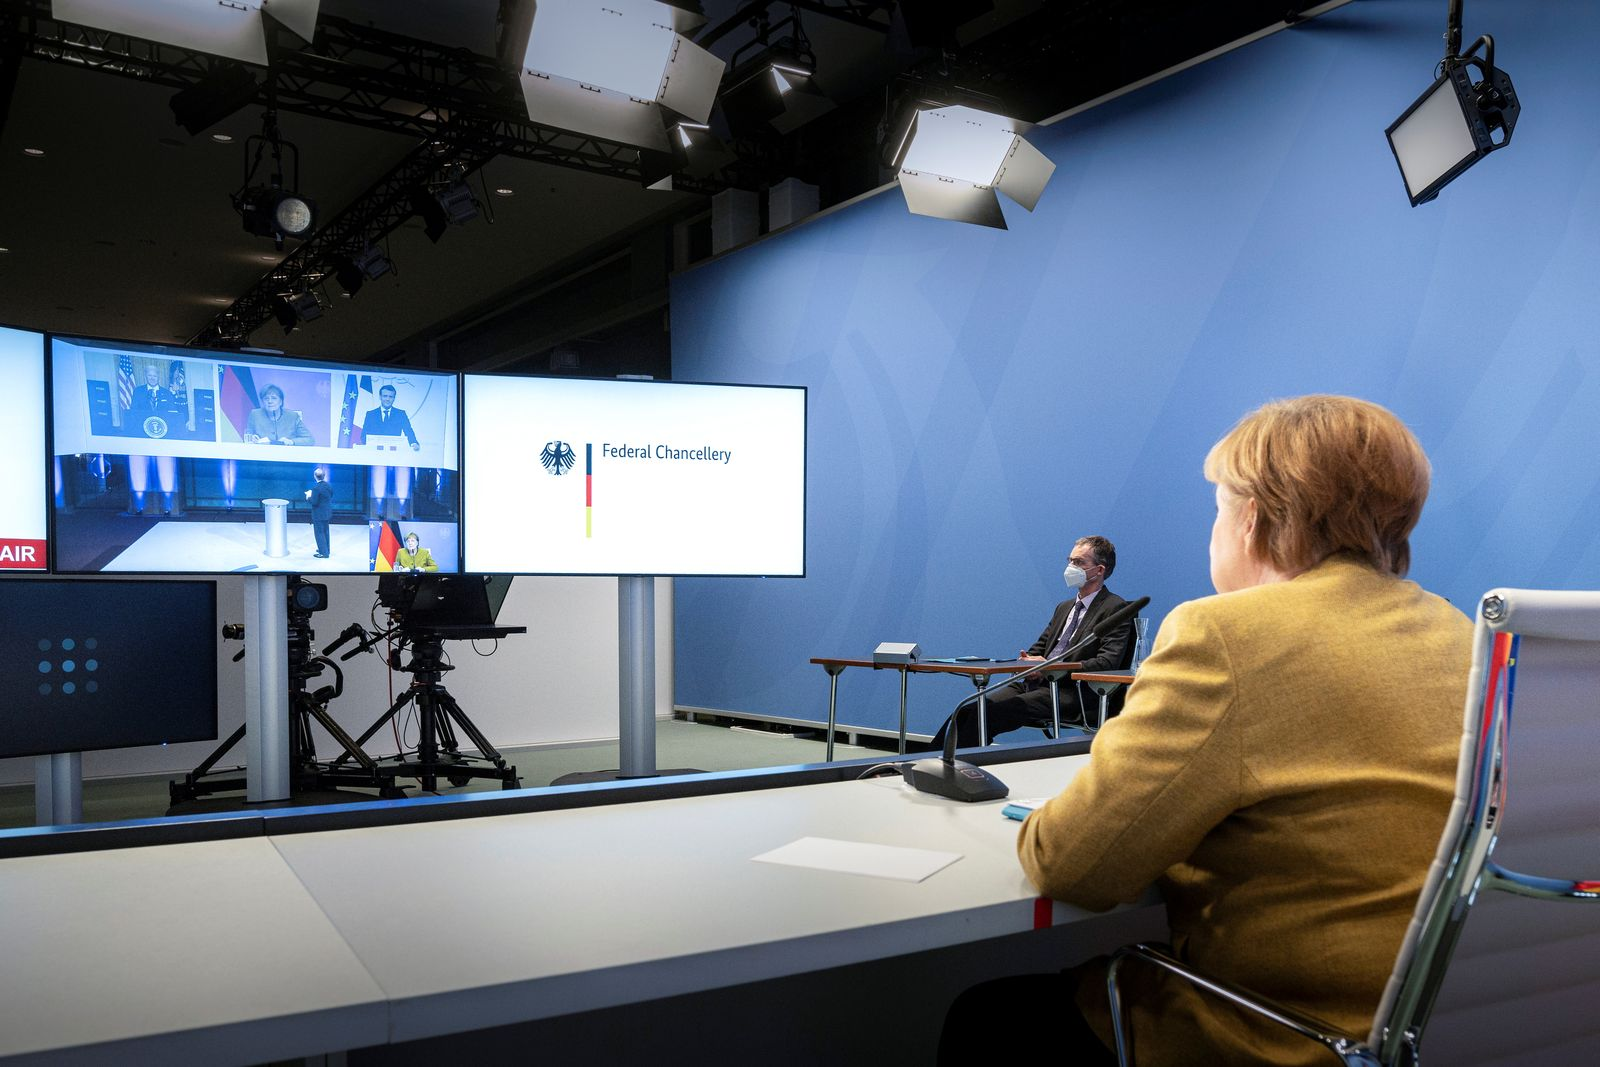 German Chancellor Merkel during virtual Munich Security Conference